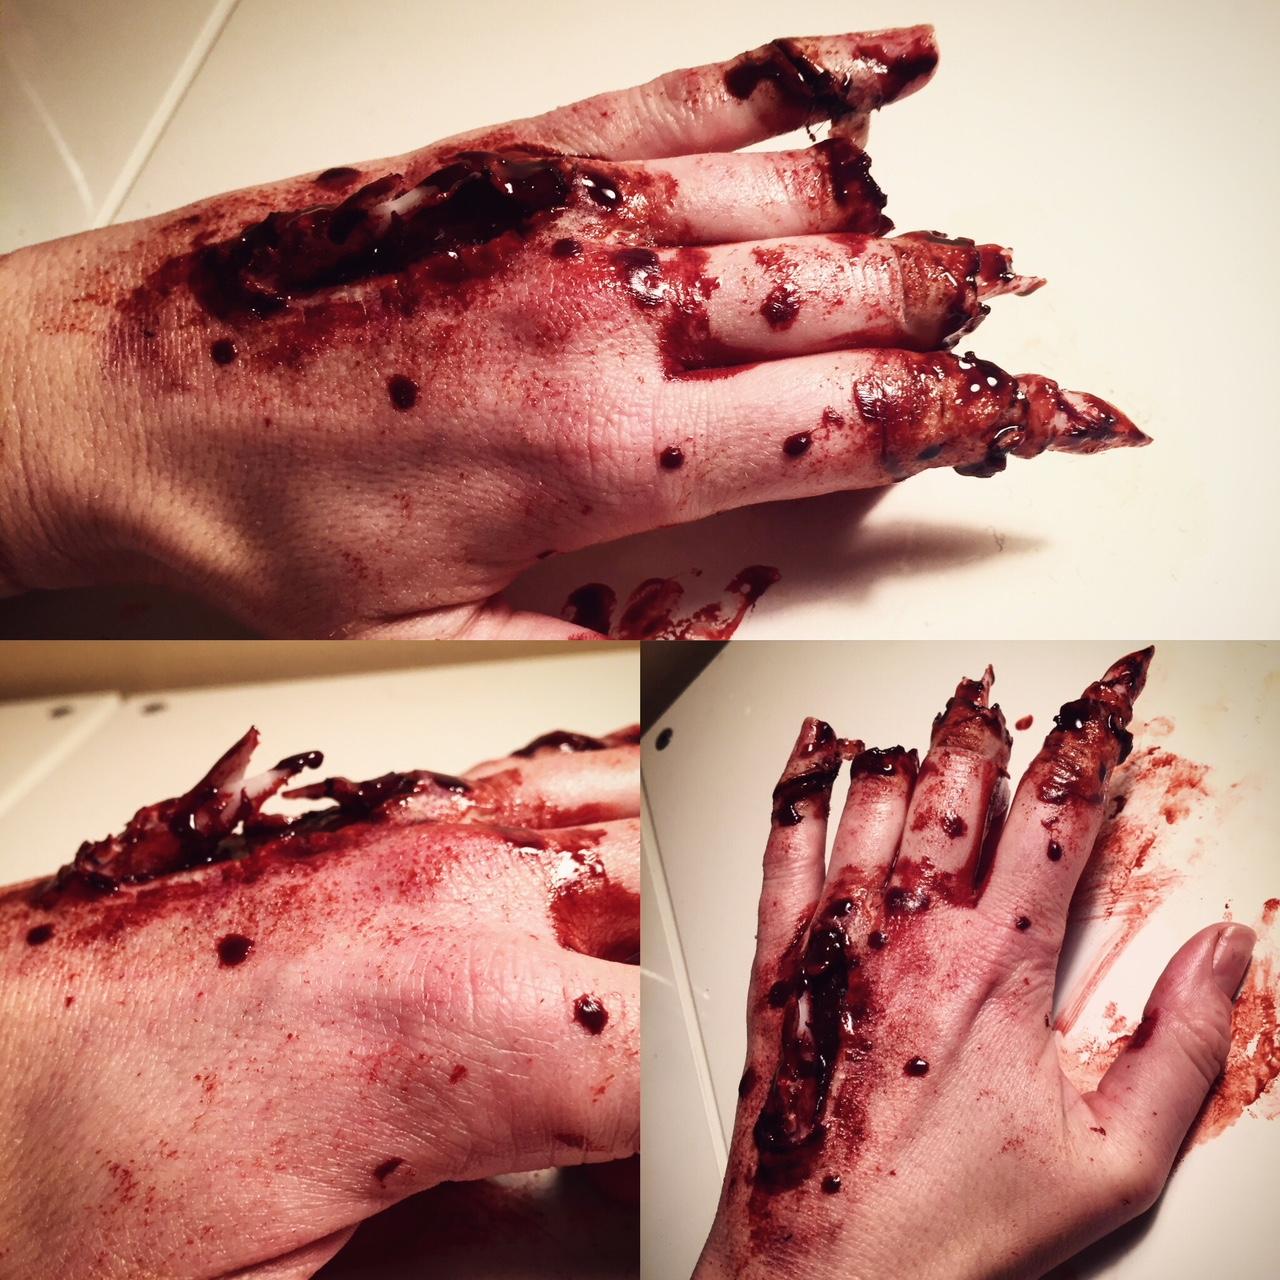 mangled hand.jpg